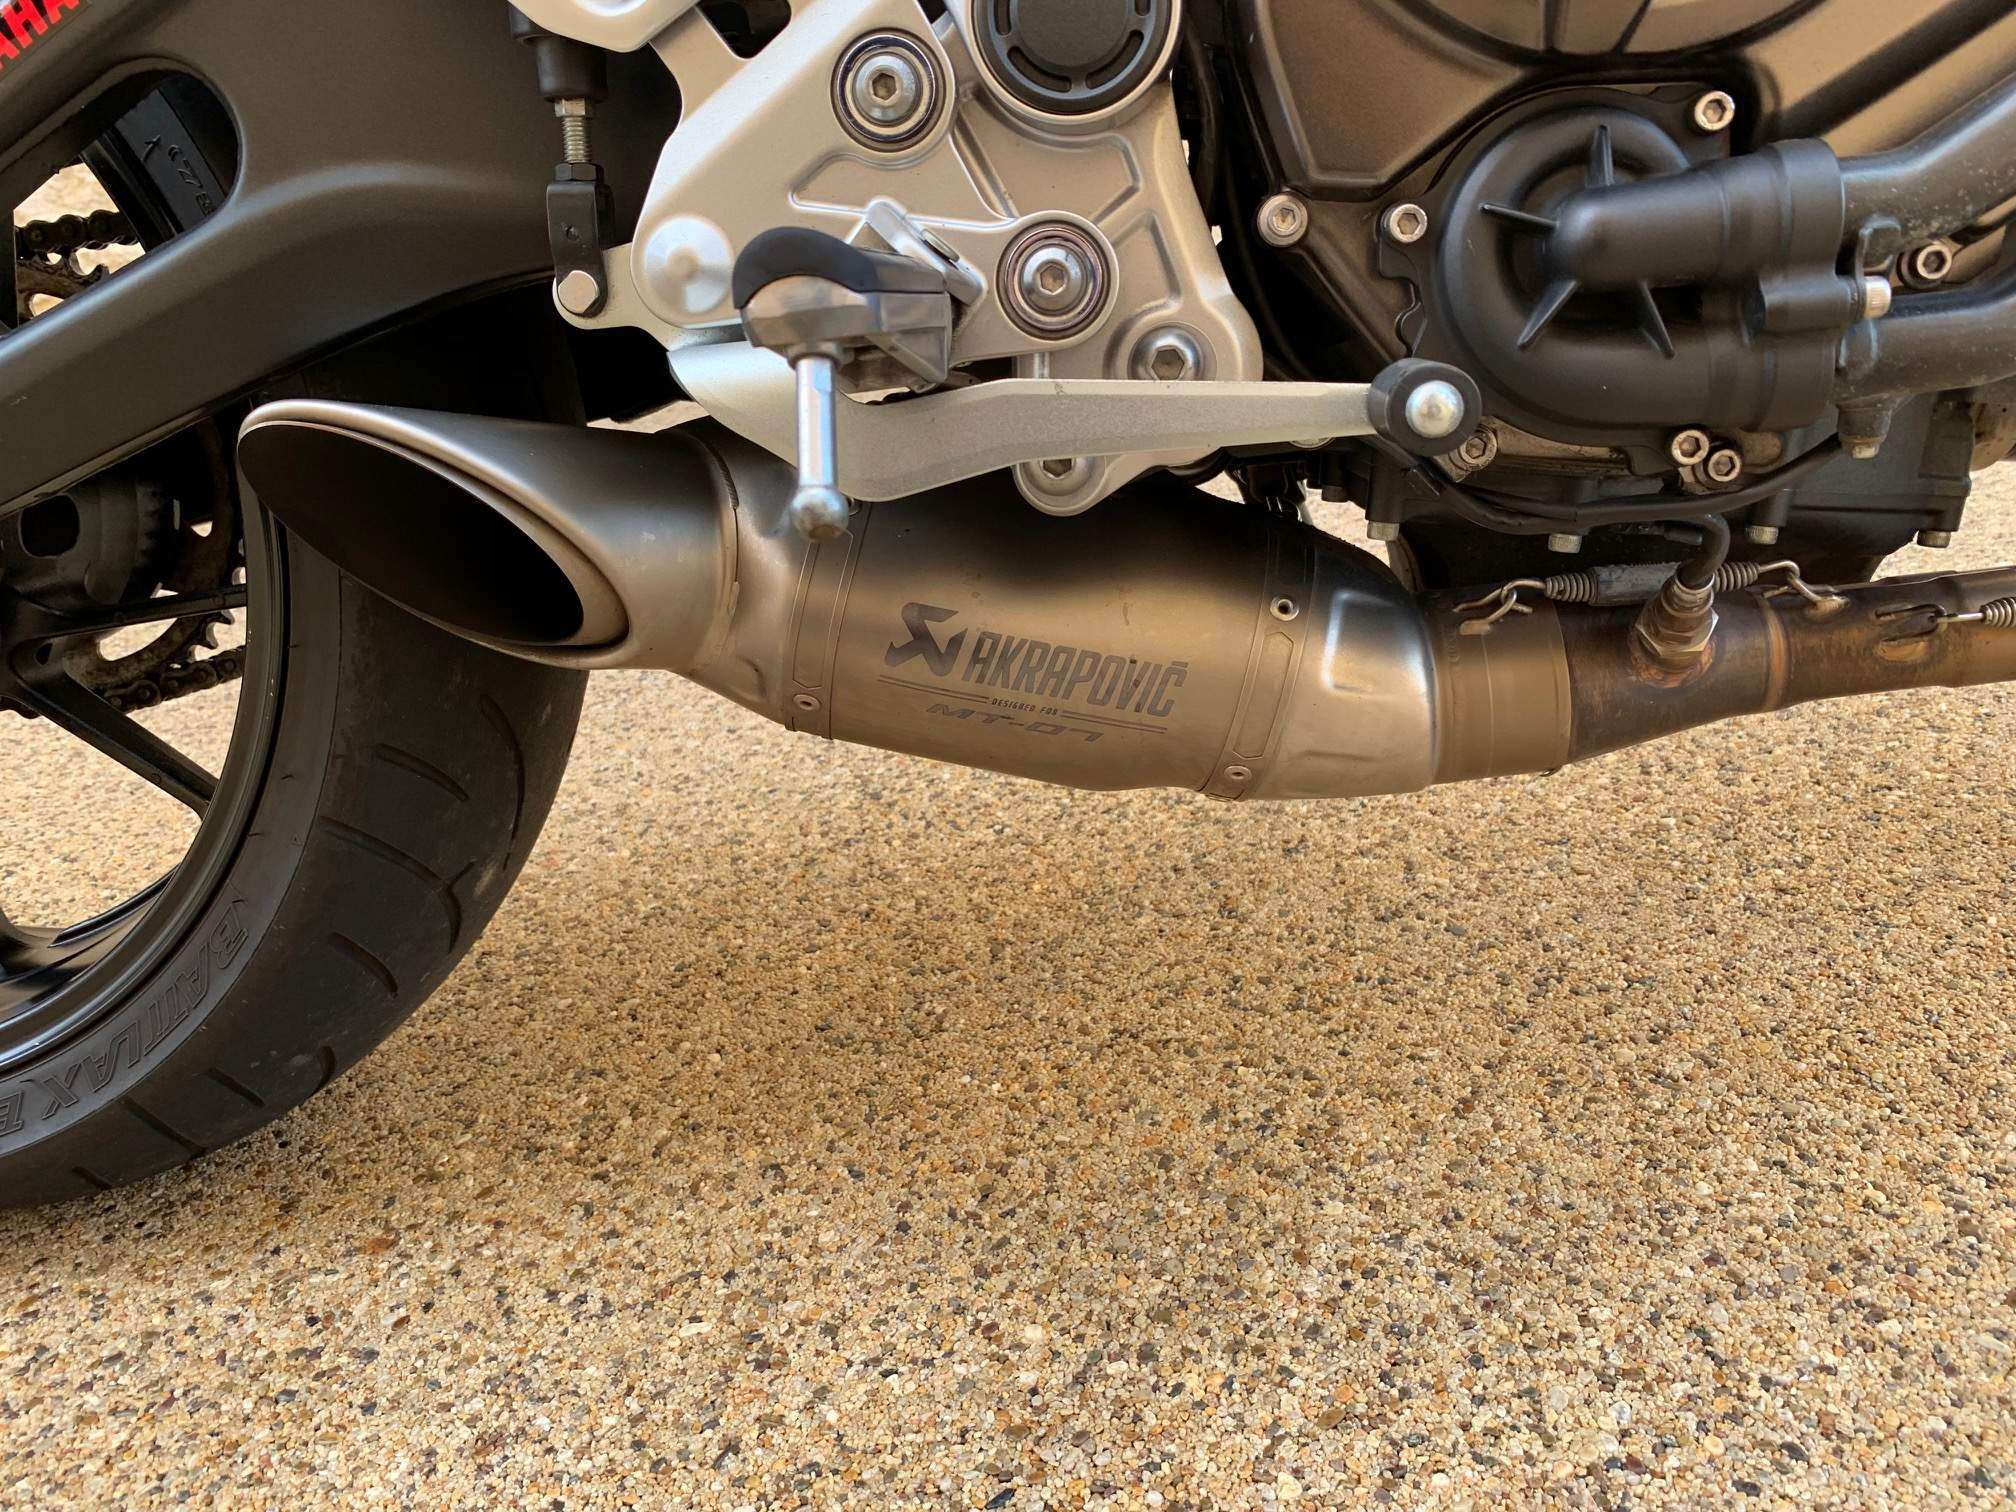 Yamaha MT-07: Used Motorcycle Price - Super Bike Trading